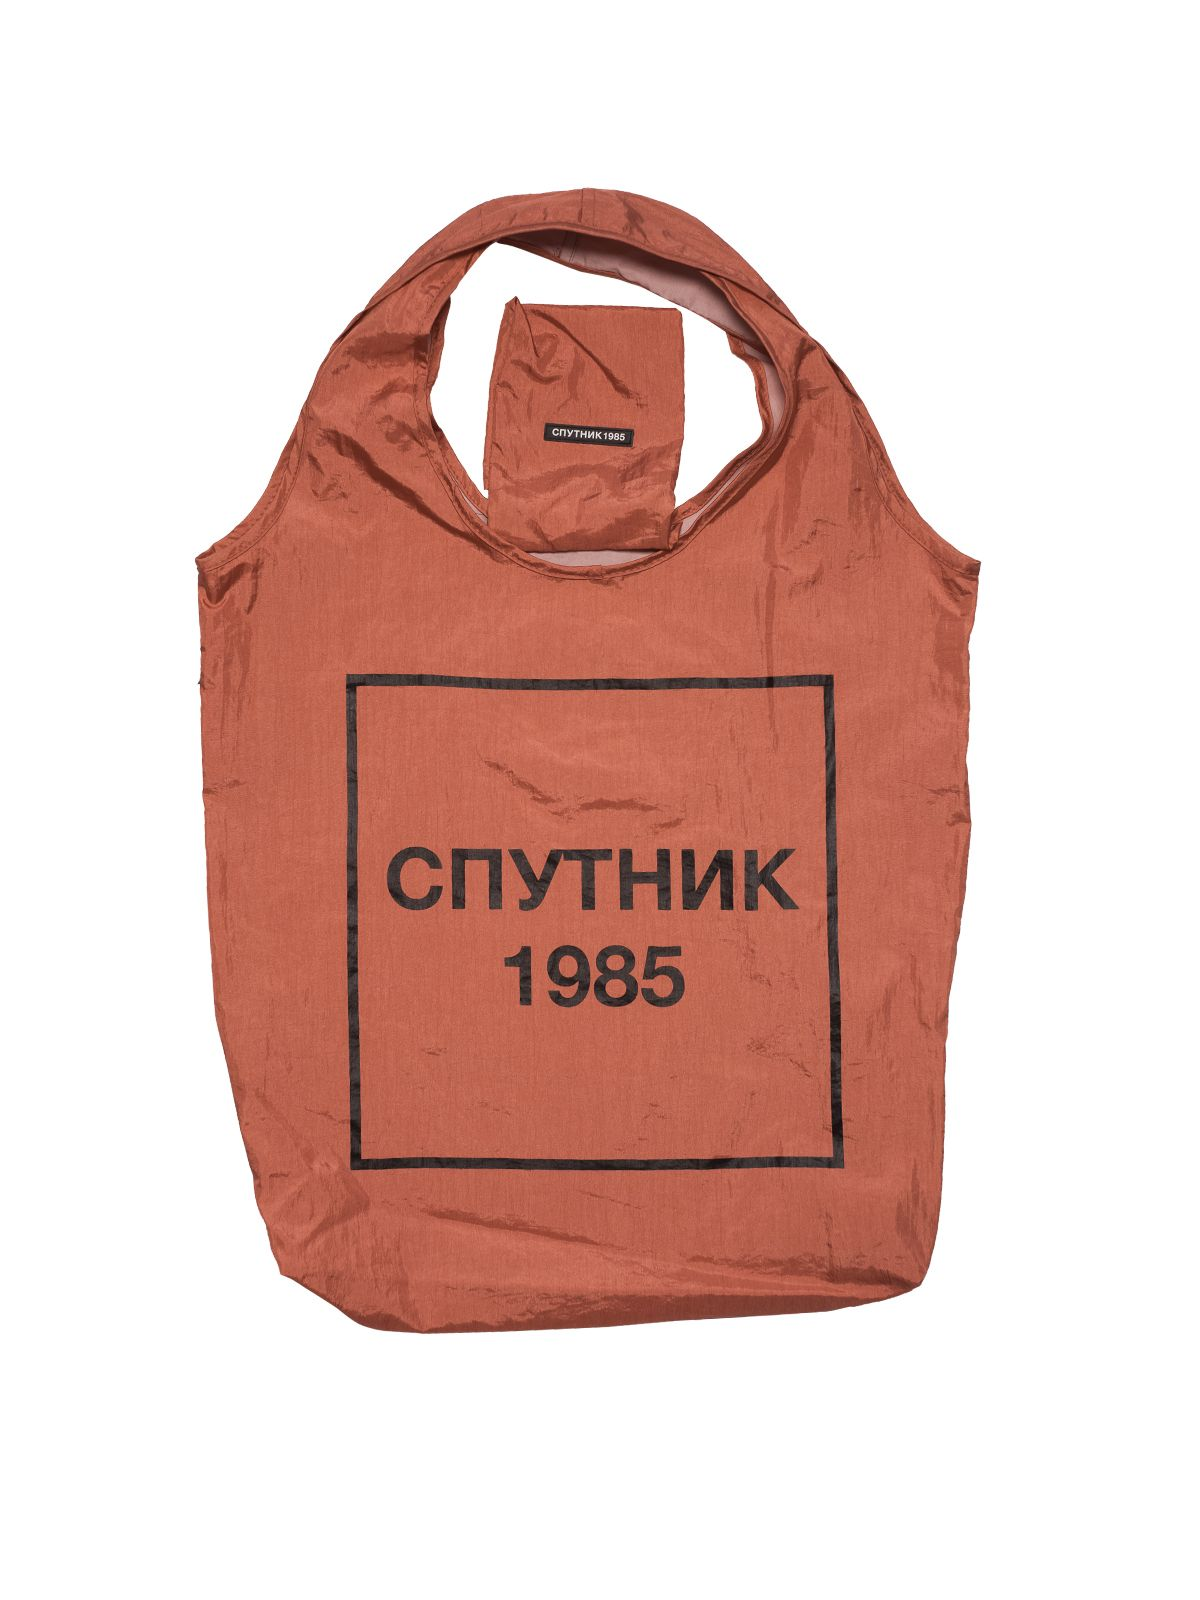 Сумка СПУТНИК1985 оранжевый AV1